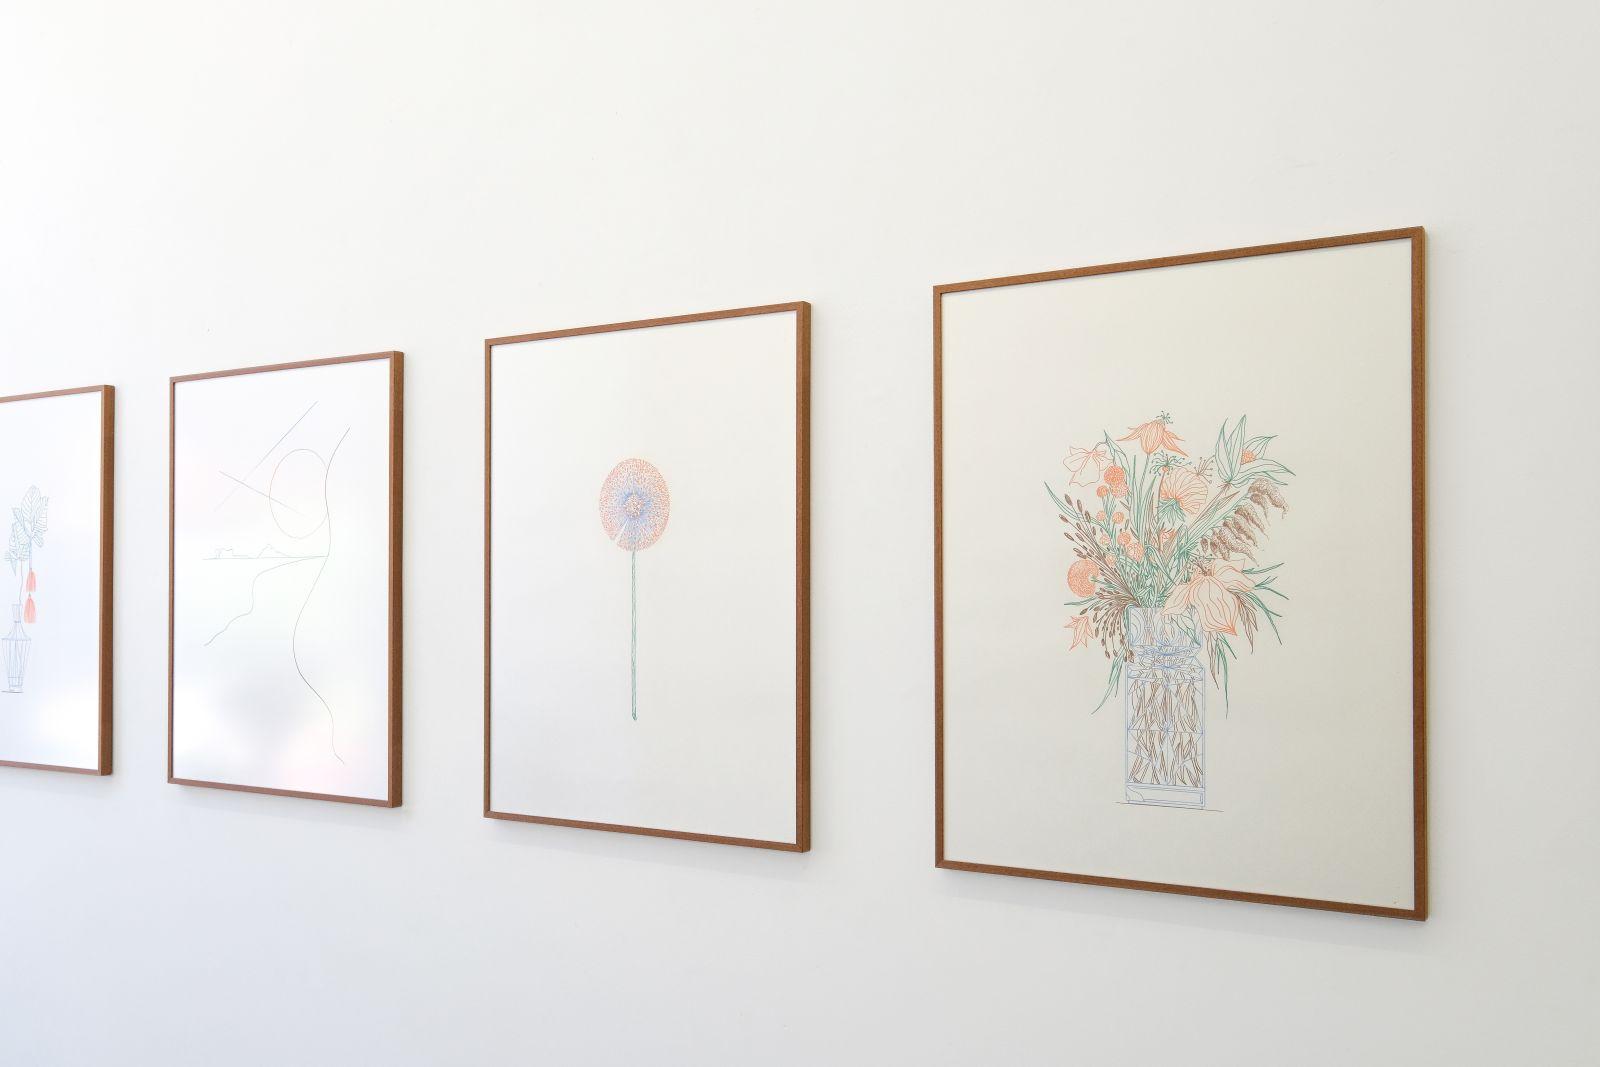 Merijn's work at Mini Galerie